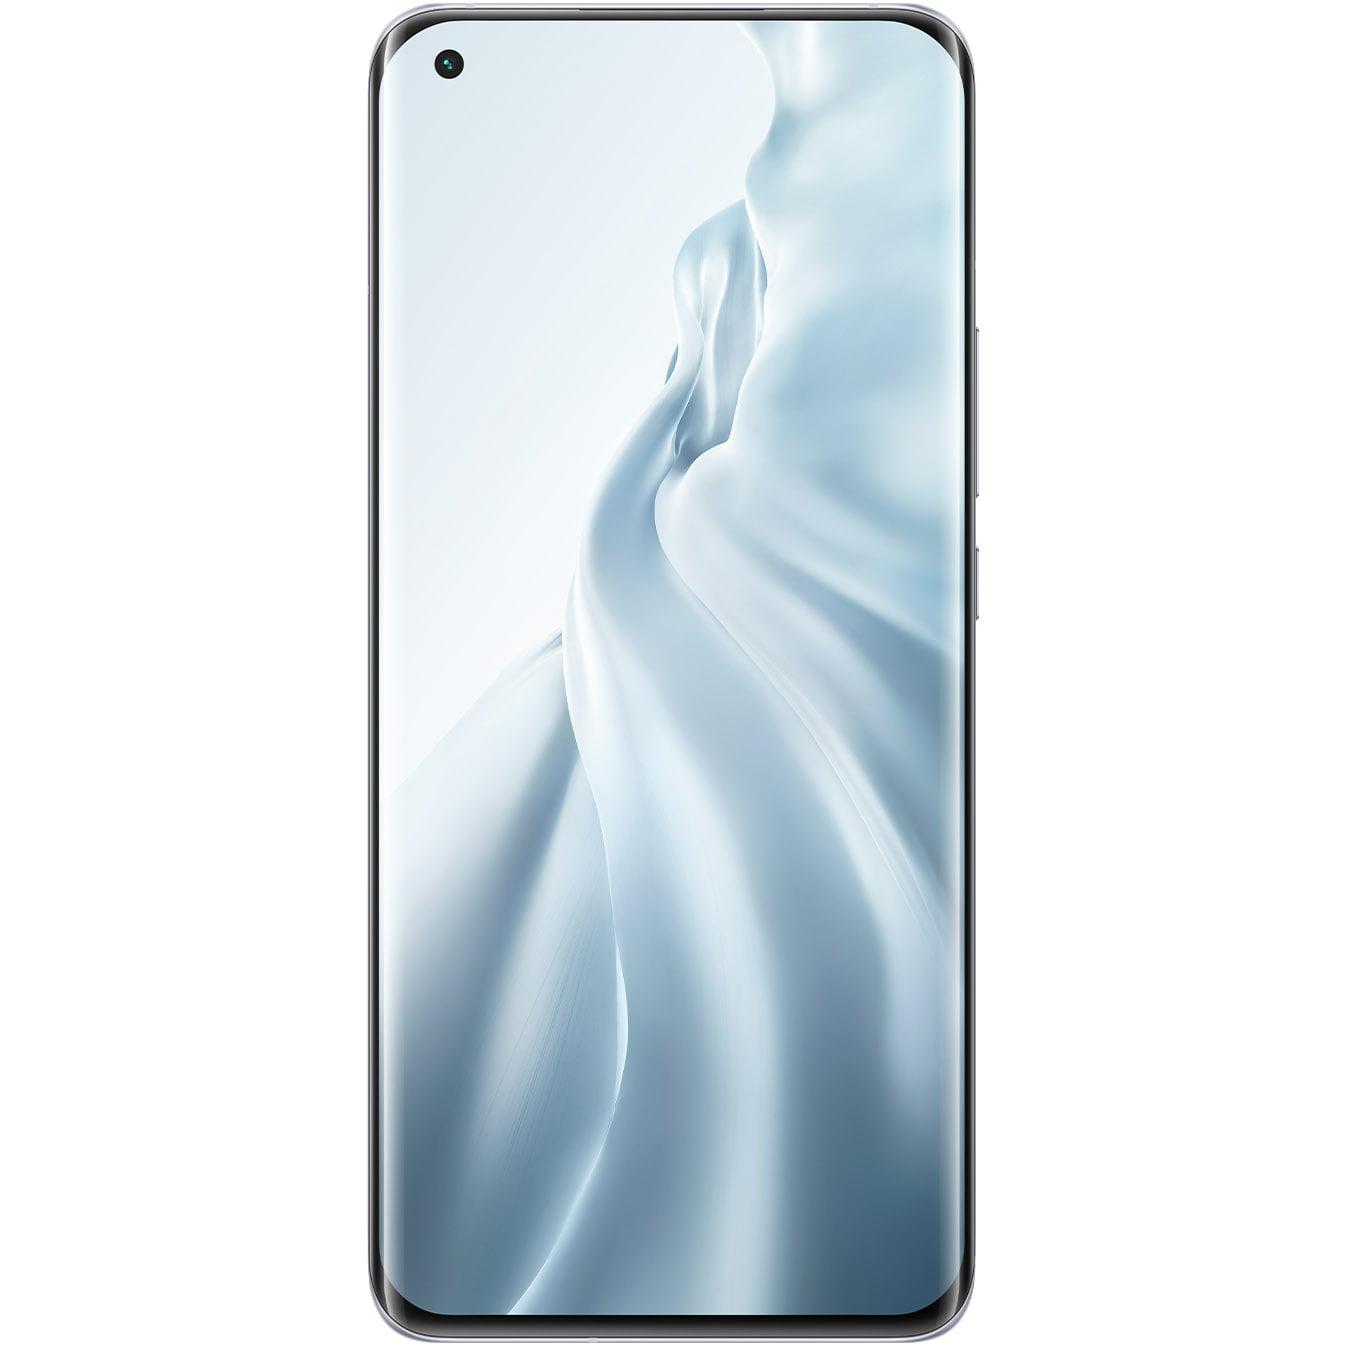 Telefon mobil Xiaomi Mi 11, Dual SIM, 128GB, 8GB RAM, 5G, Cloud White